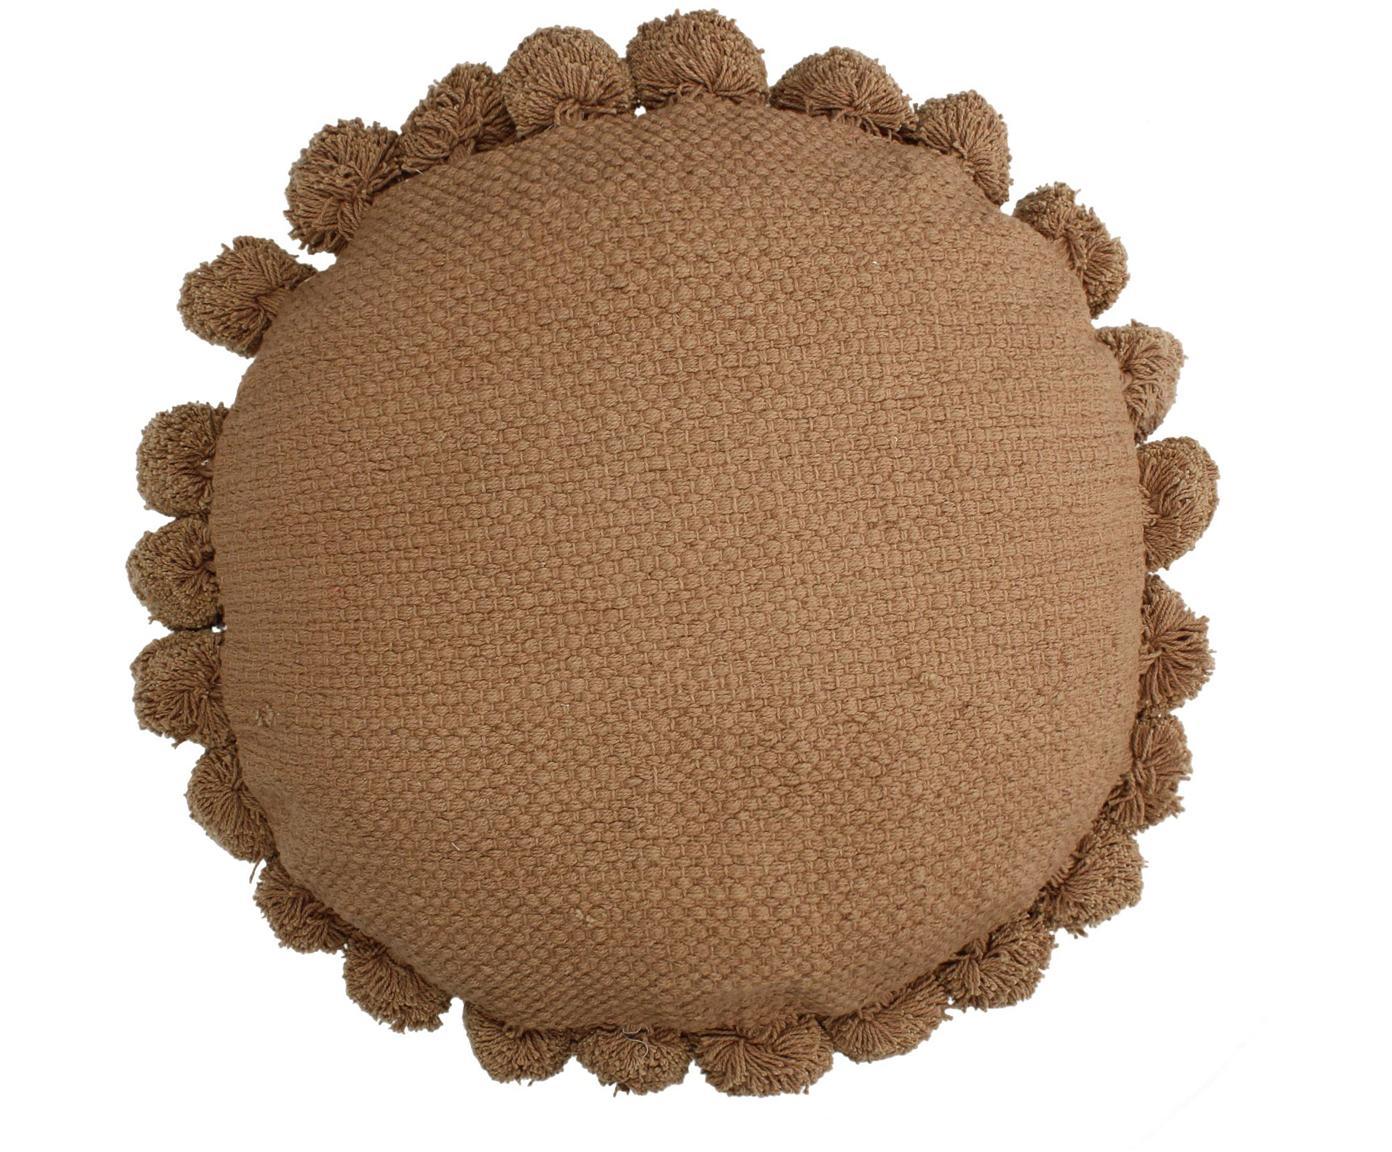 Rond kussen Betta met pompoms, met vulling, Perzikkleurig, Ø 45 cm